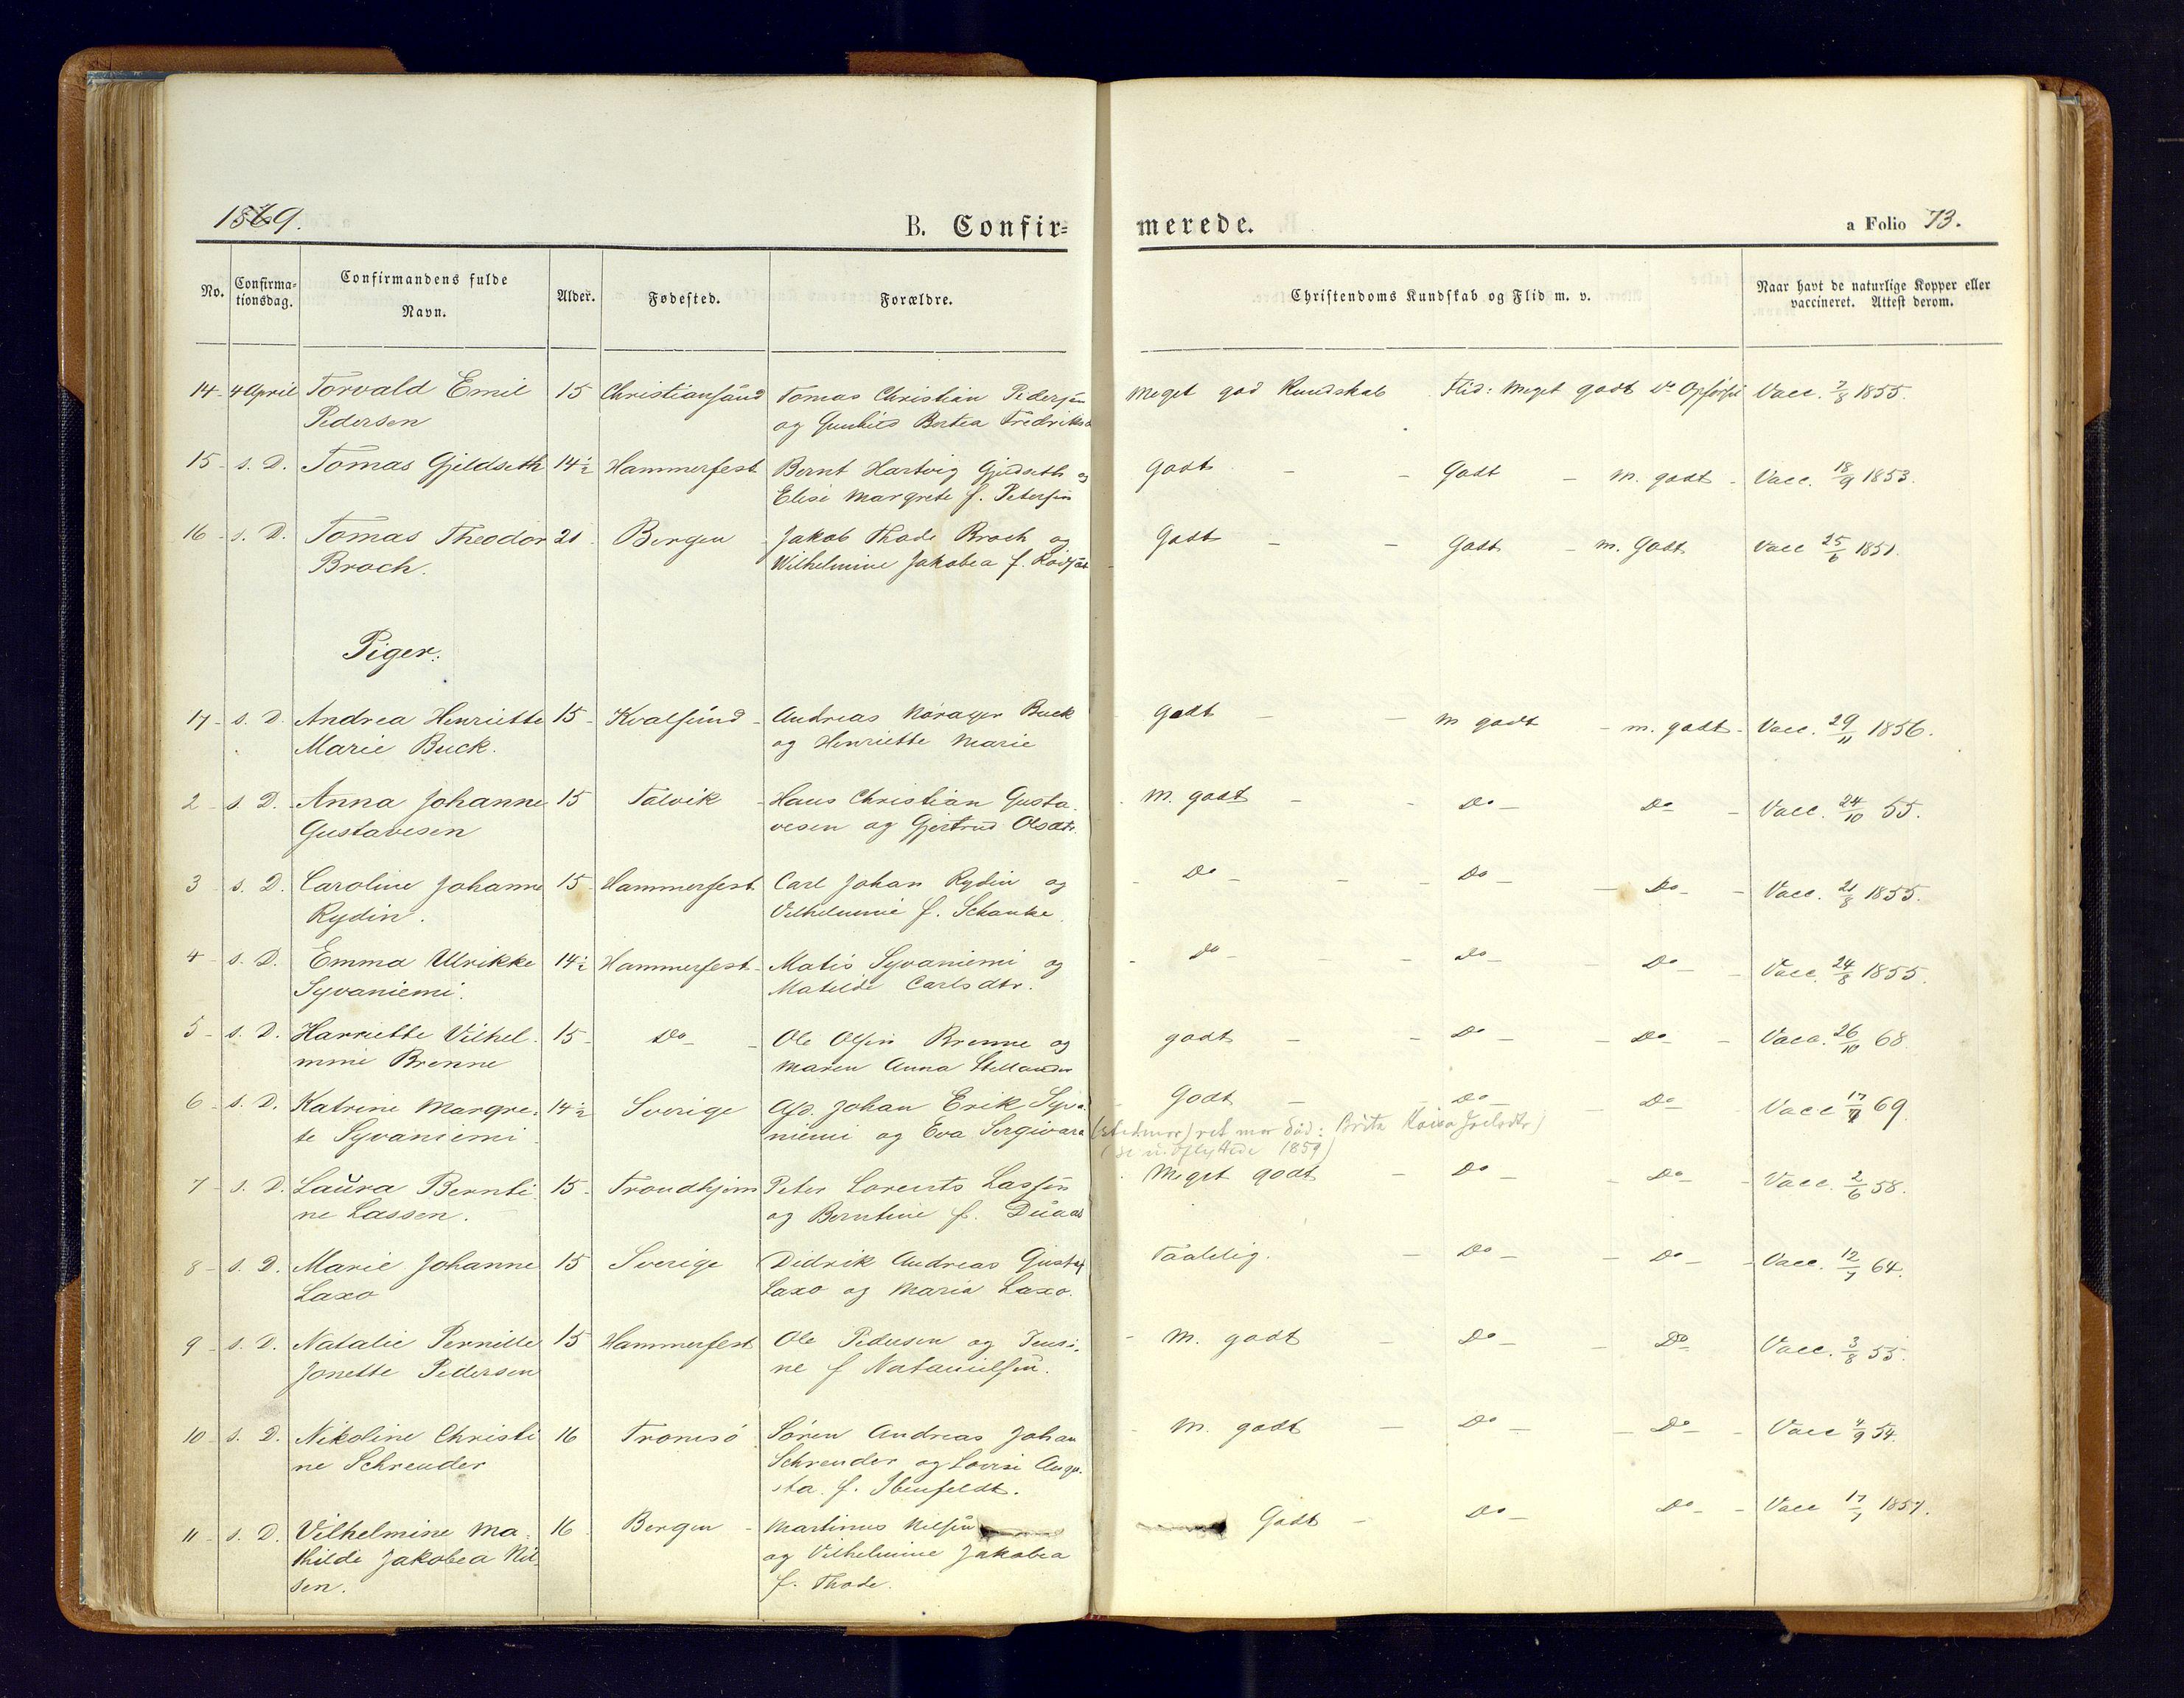 SATØ, Hammerfest sokneprestembete, Ministerialbok nr. 6, 1869-1877, s. 73